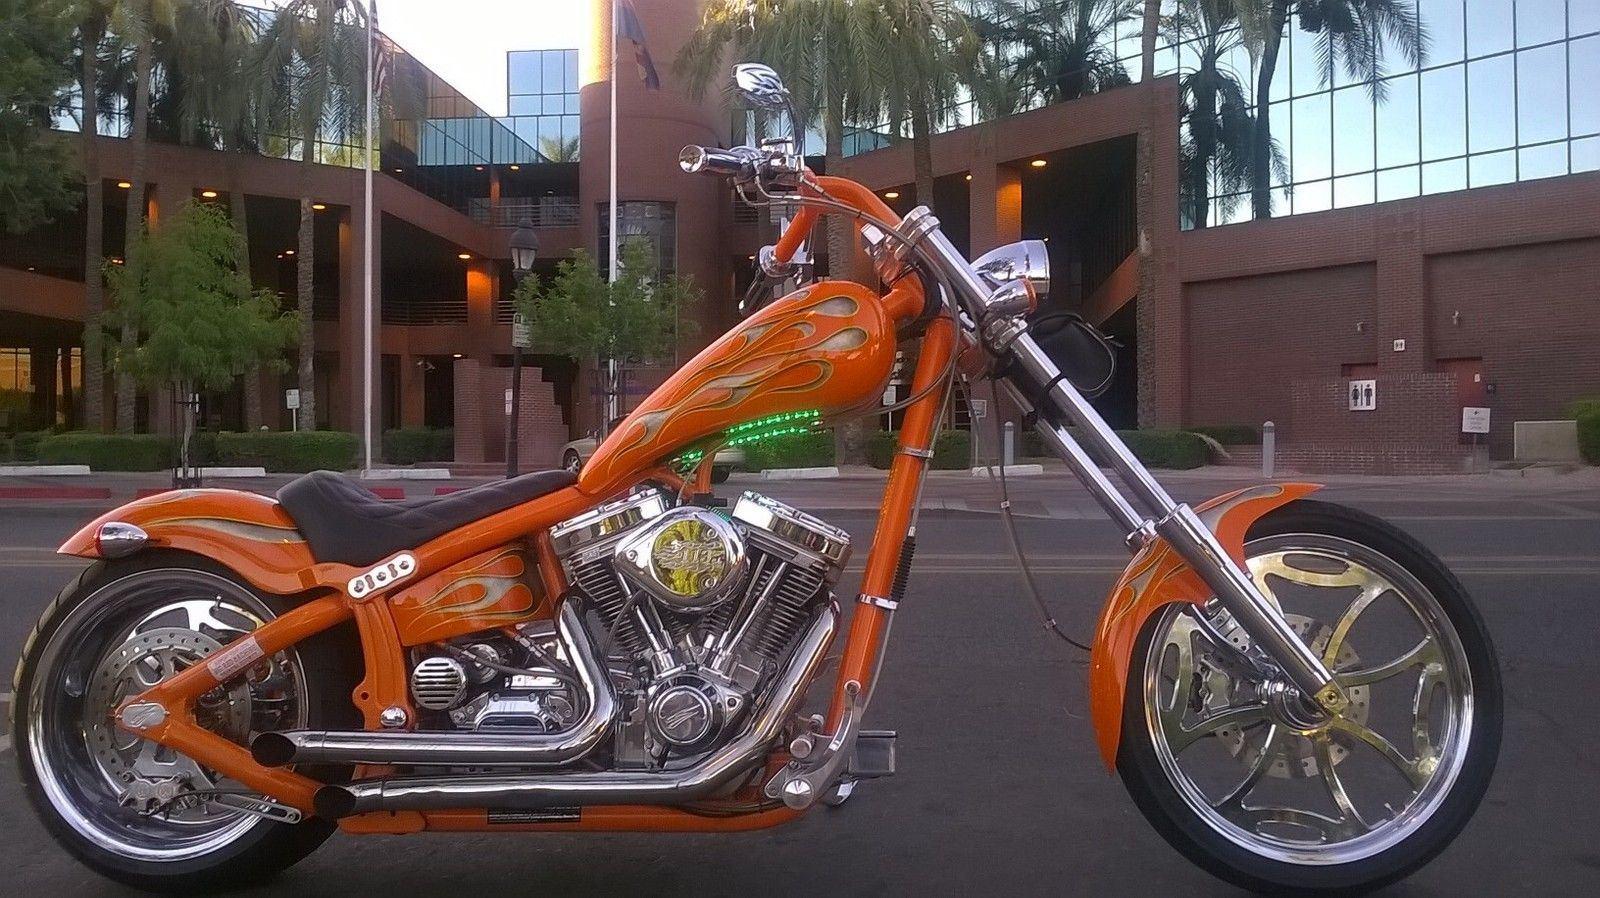 Swift 2004 Custom Bar Chopper 113 S S Sidewinder Motor 6 Speed Transmission For Sale